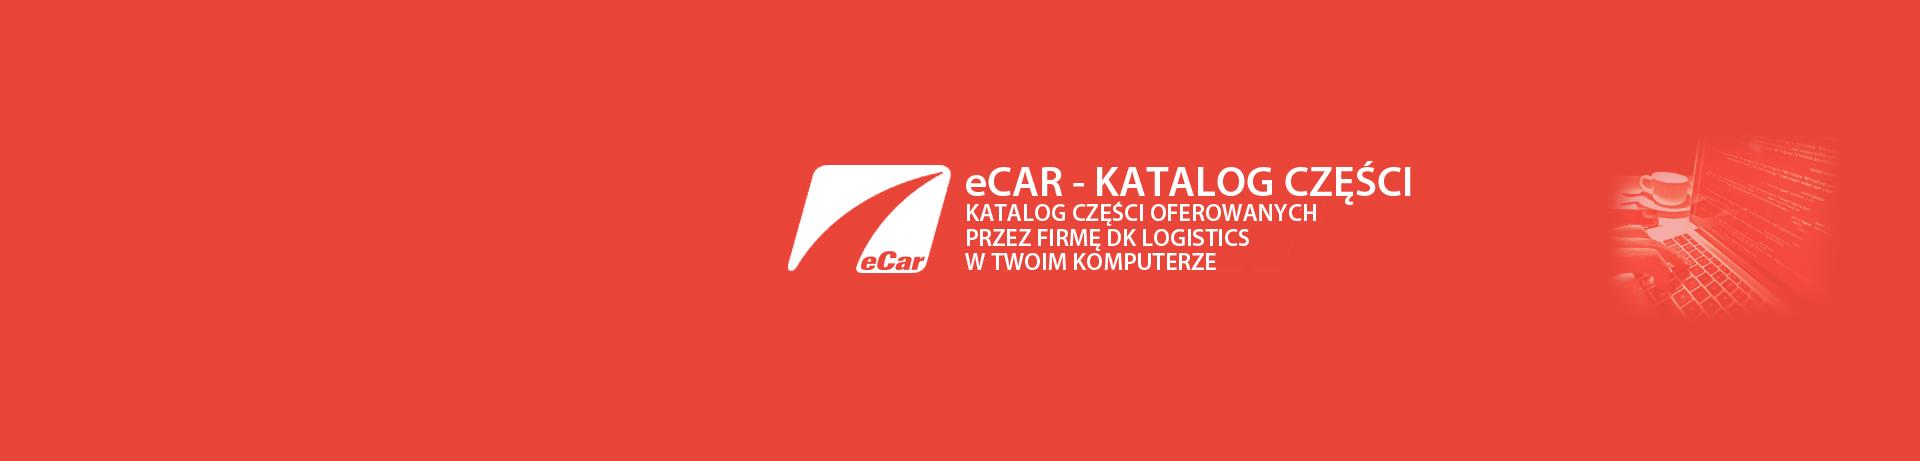 eCAR - banner